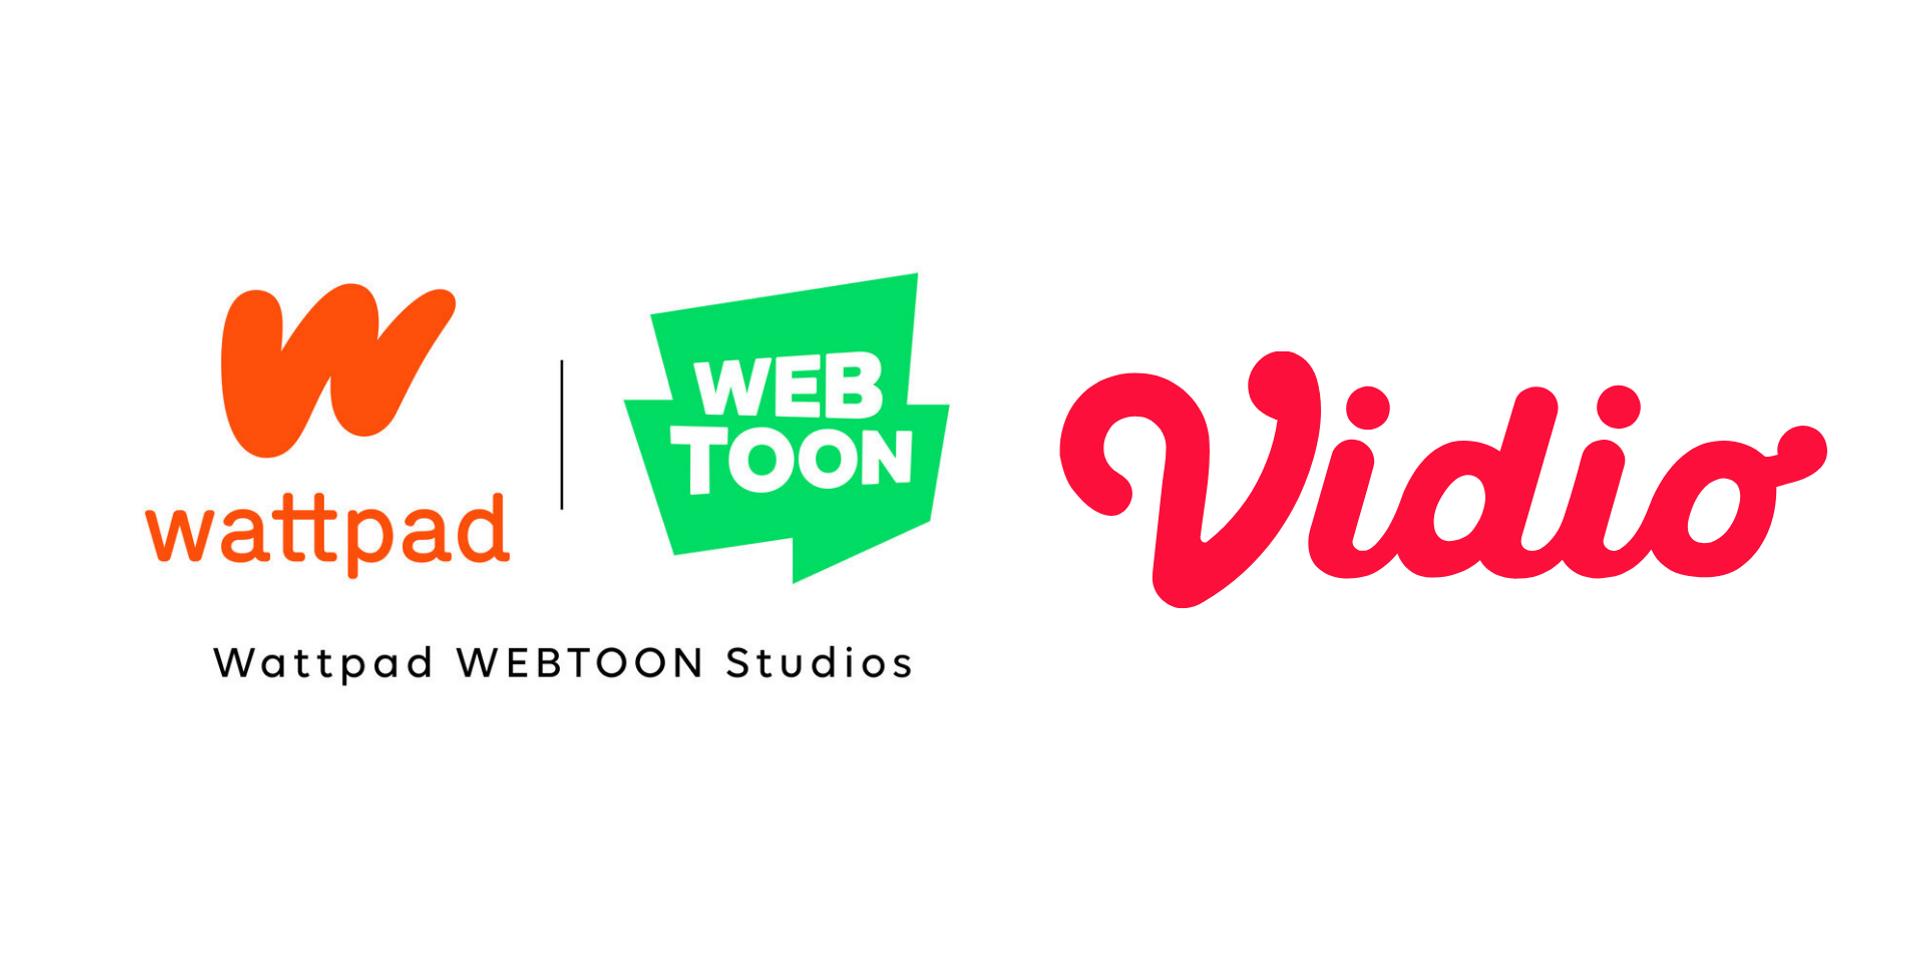 Wattpad Webtoon renews deal with Indonesian streaming service Vidio